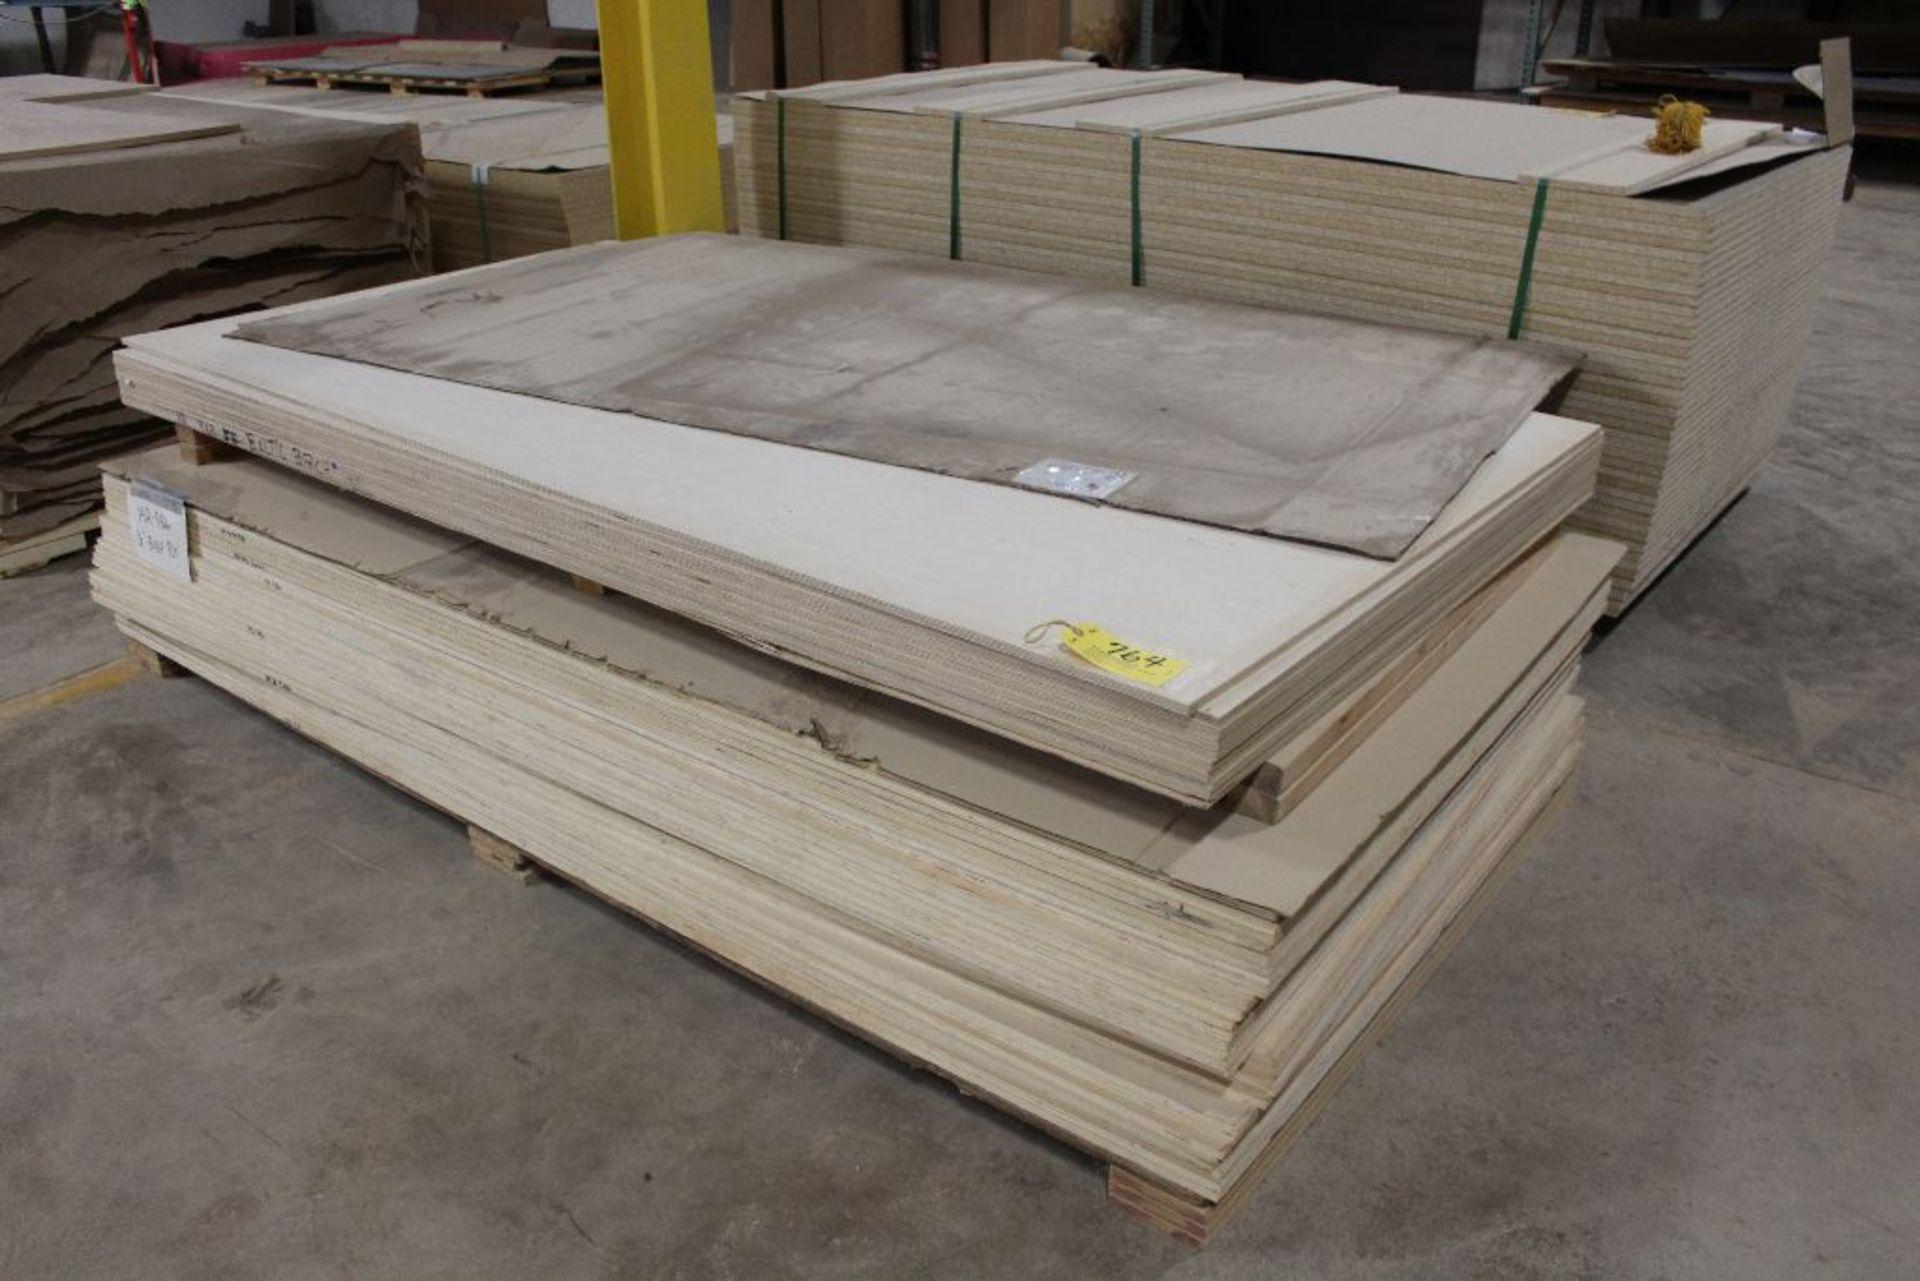 "Lot 764 - Lumber, (37) plywood Baltic birch, 1/2"" x 49"" x 97""."